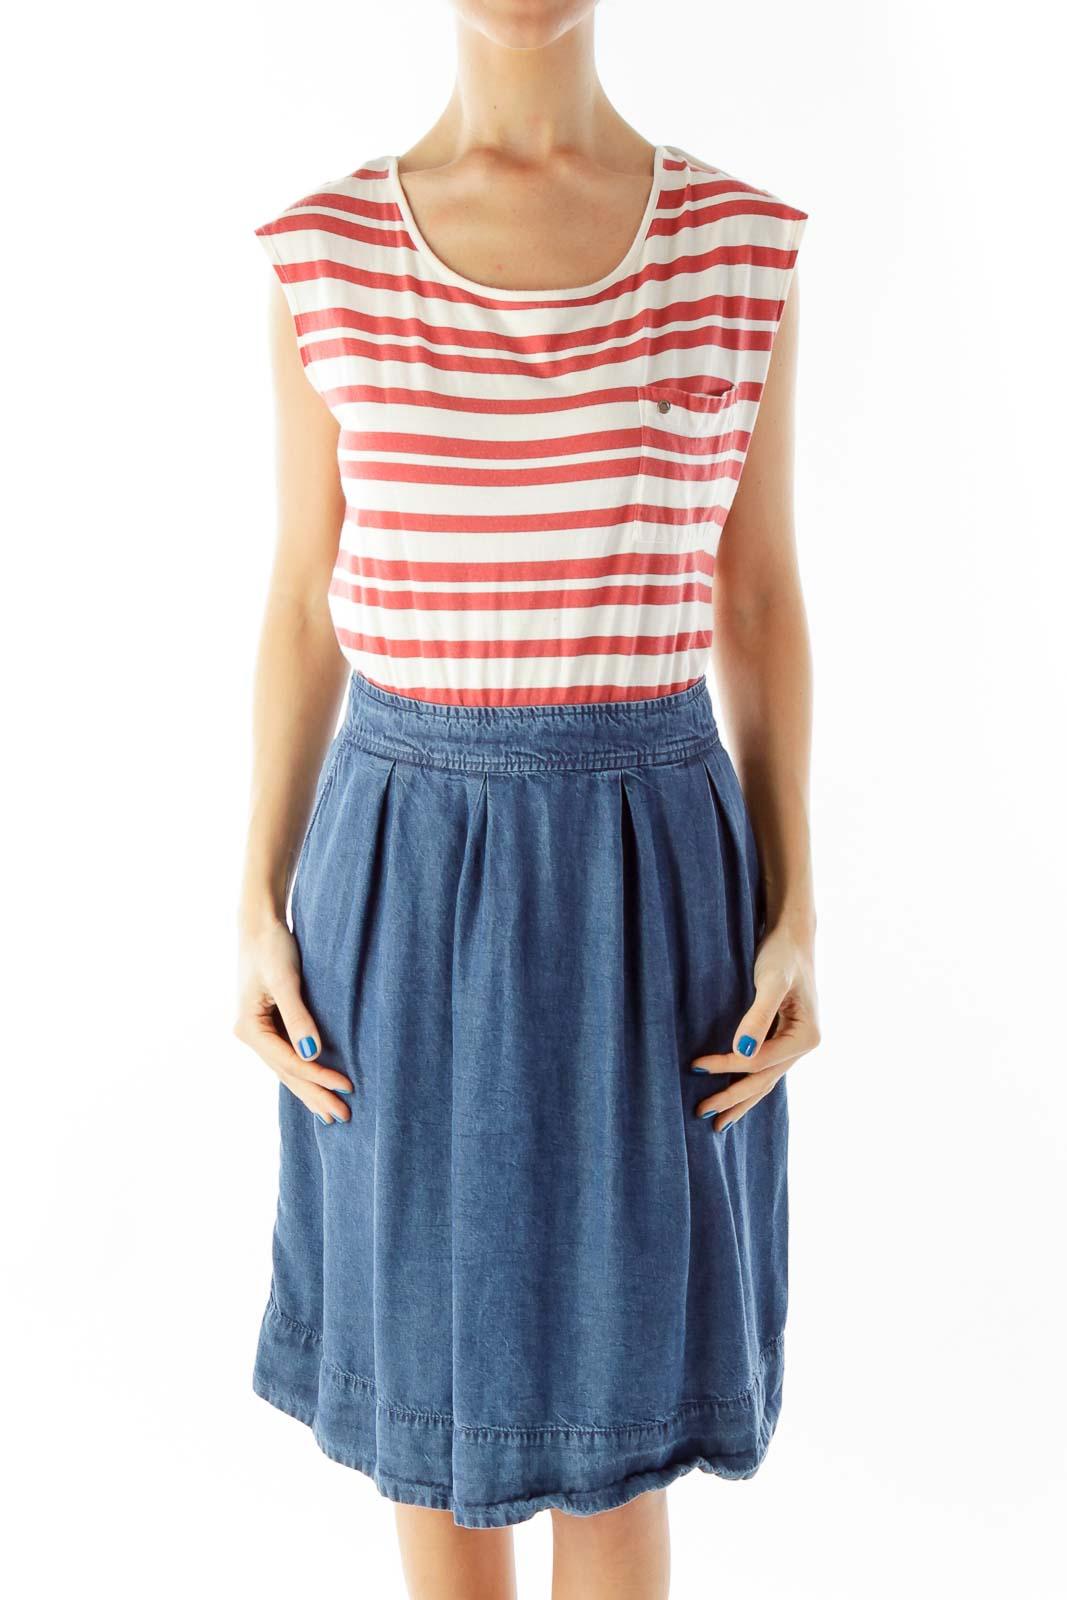 Red White Blue Striped Dress